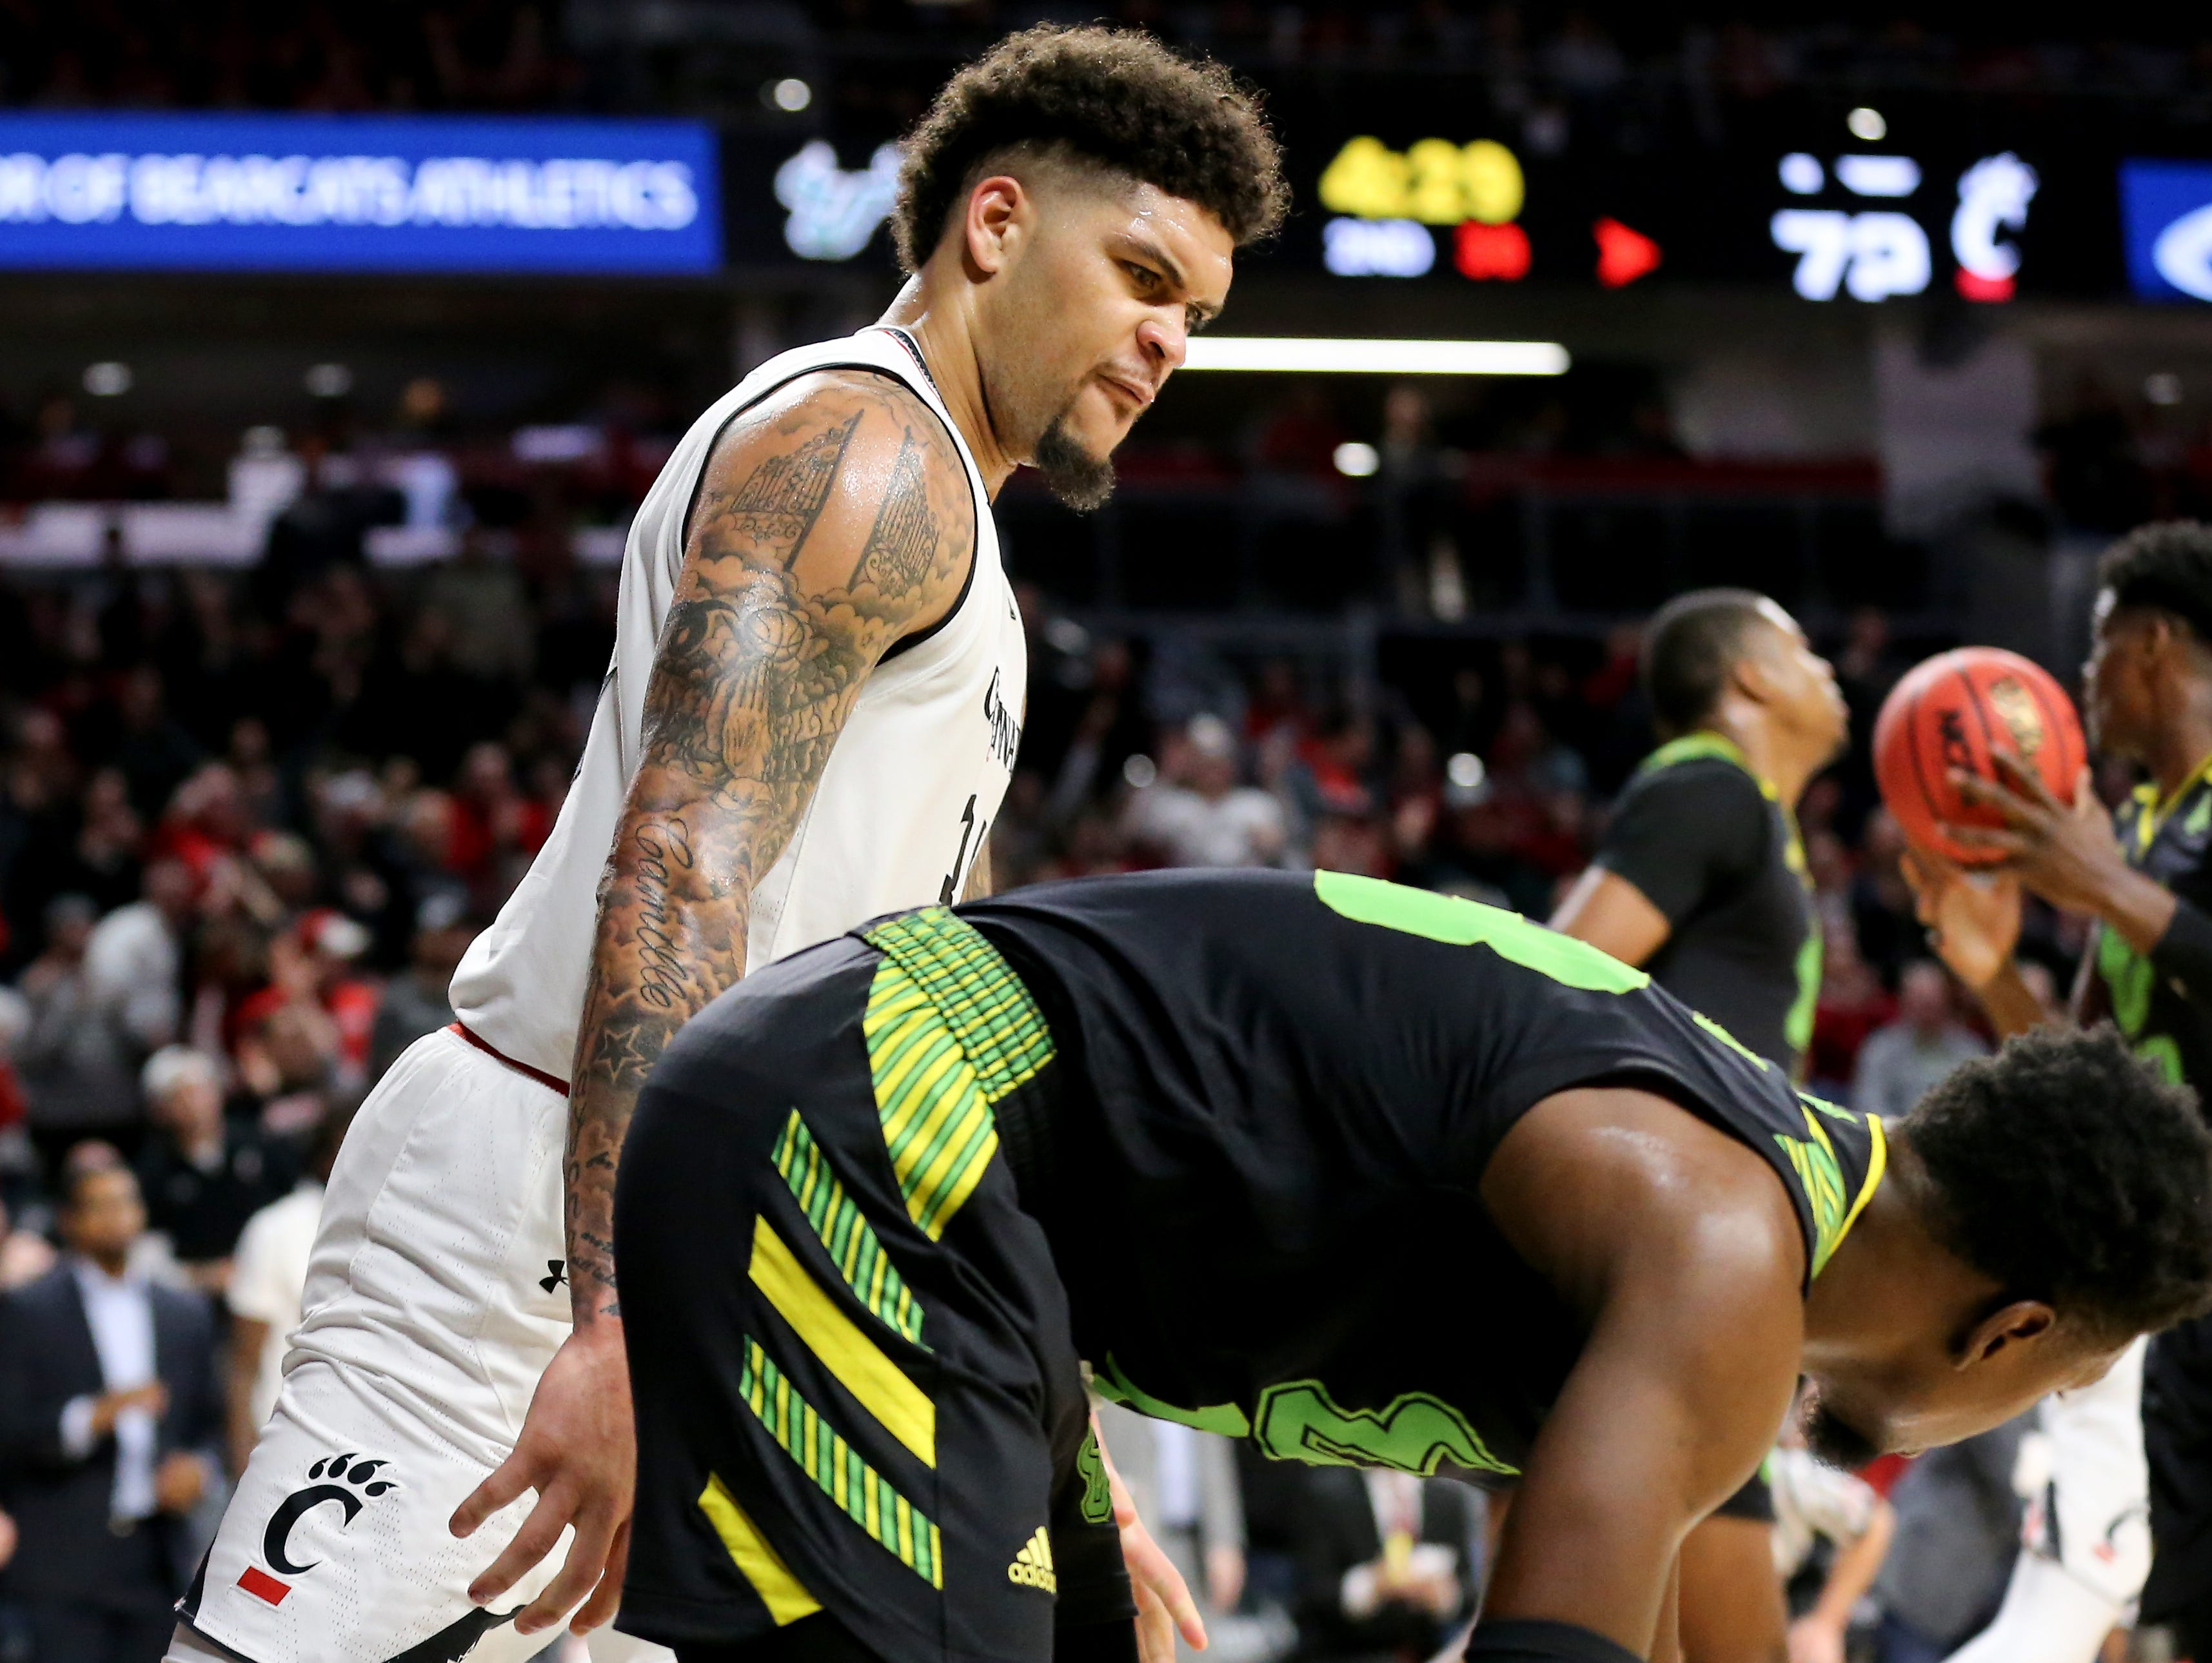 Cincinnati Bearcats guard Jarron Cumberland (34) stares down South Florida Bulls guard Justin Brown (13) in the second half of an NCAA college basketball game, Tuesday, Jan. 15, 2019, at Fifth Third Arena in Cincinnati. Cincinnati won 82-74.